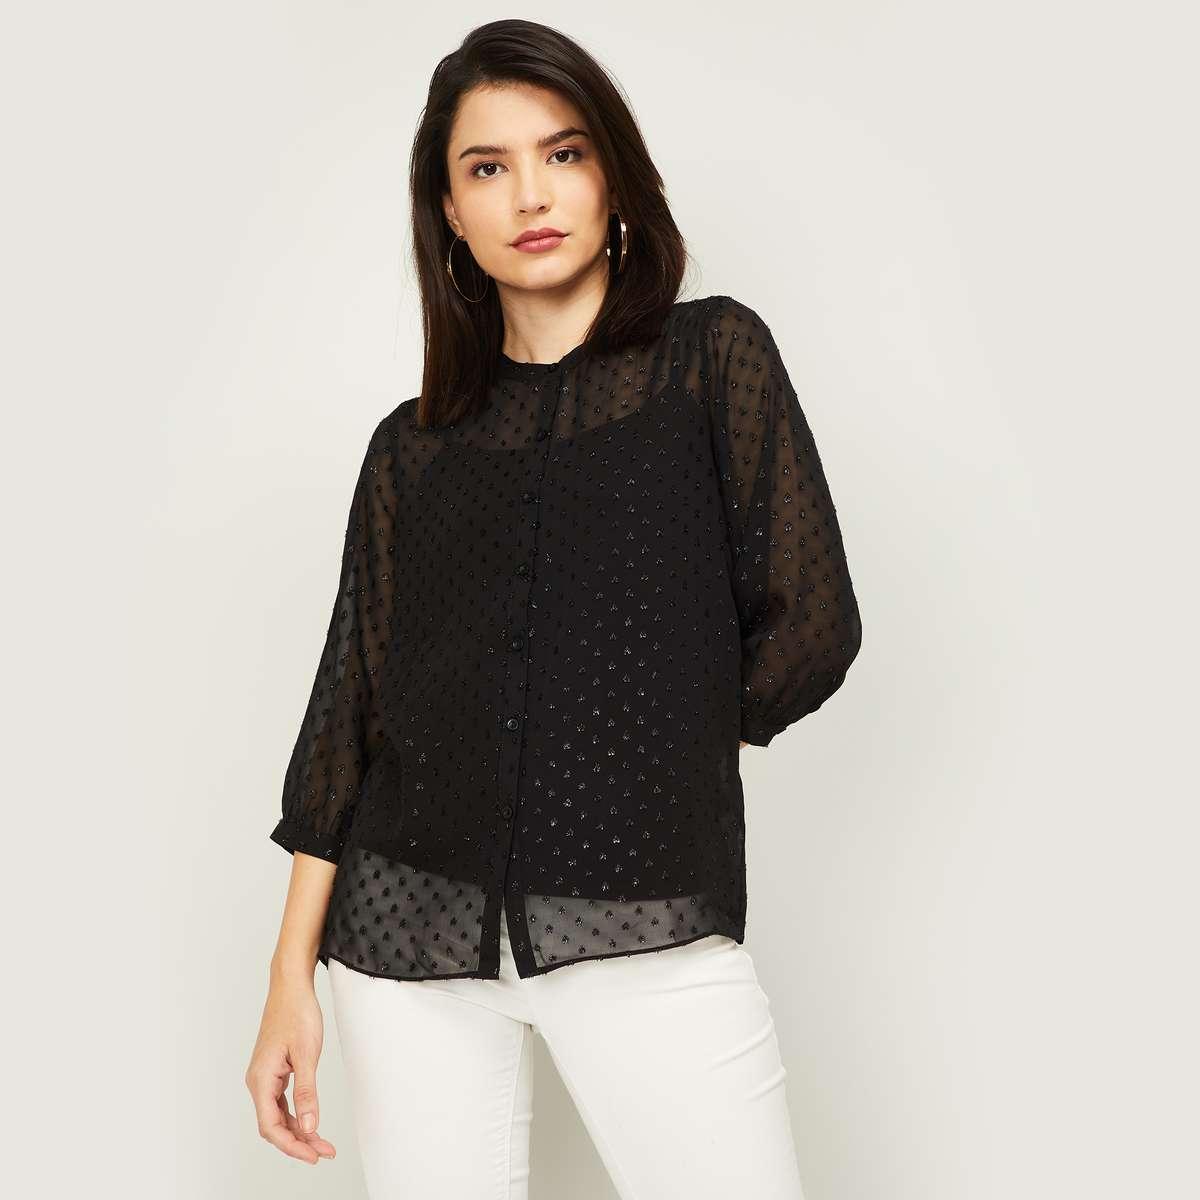 1.BOSSINI Women Embellished Sheer Top